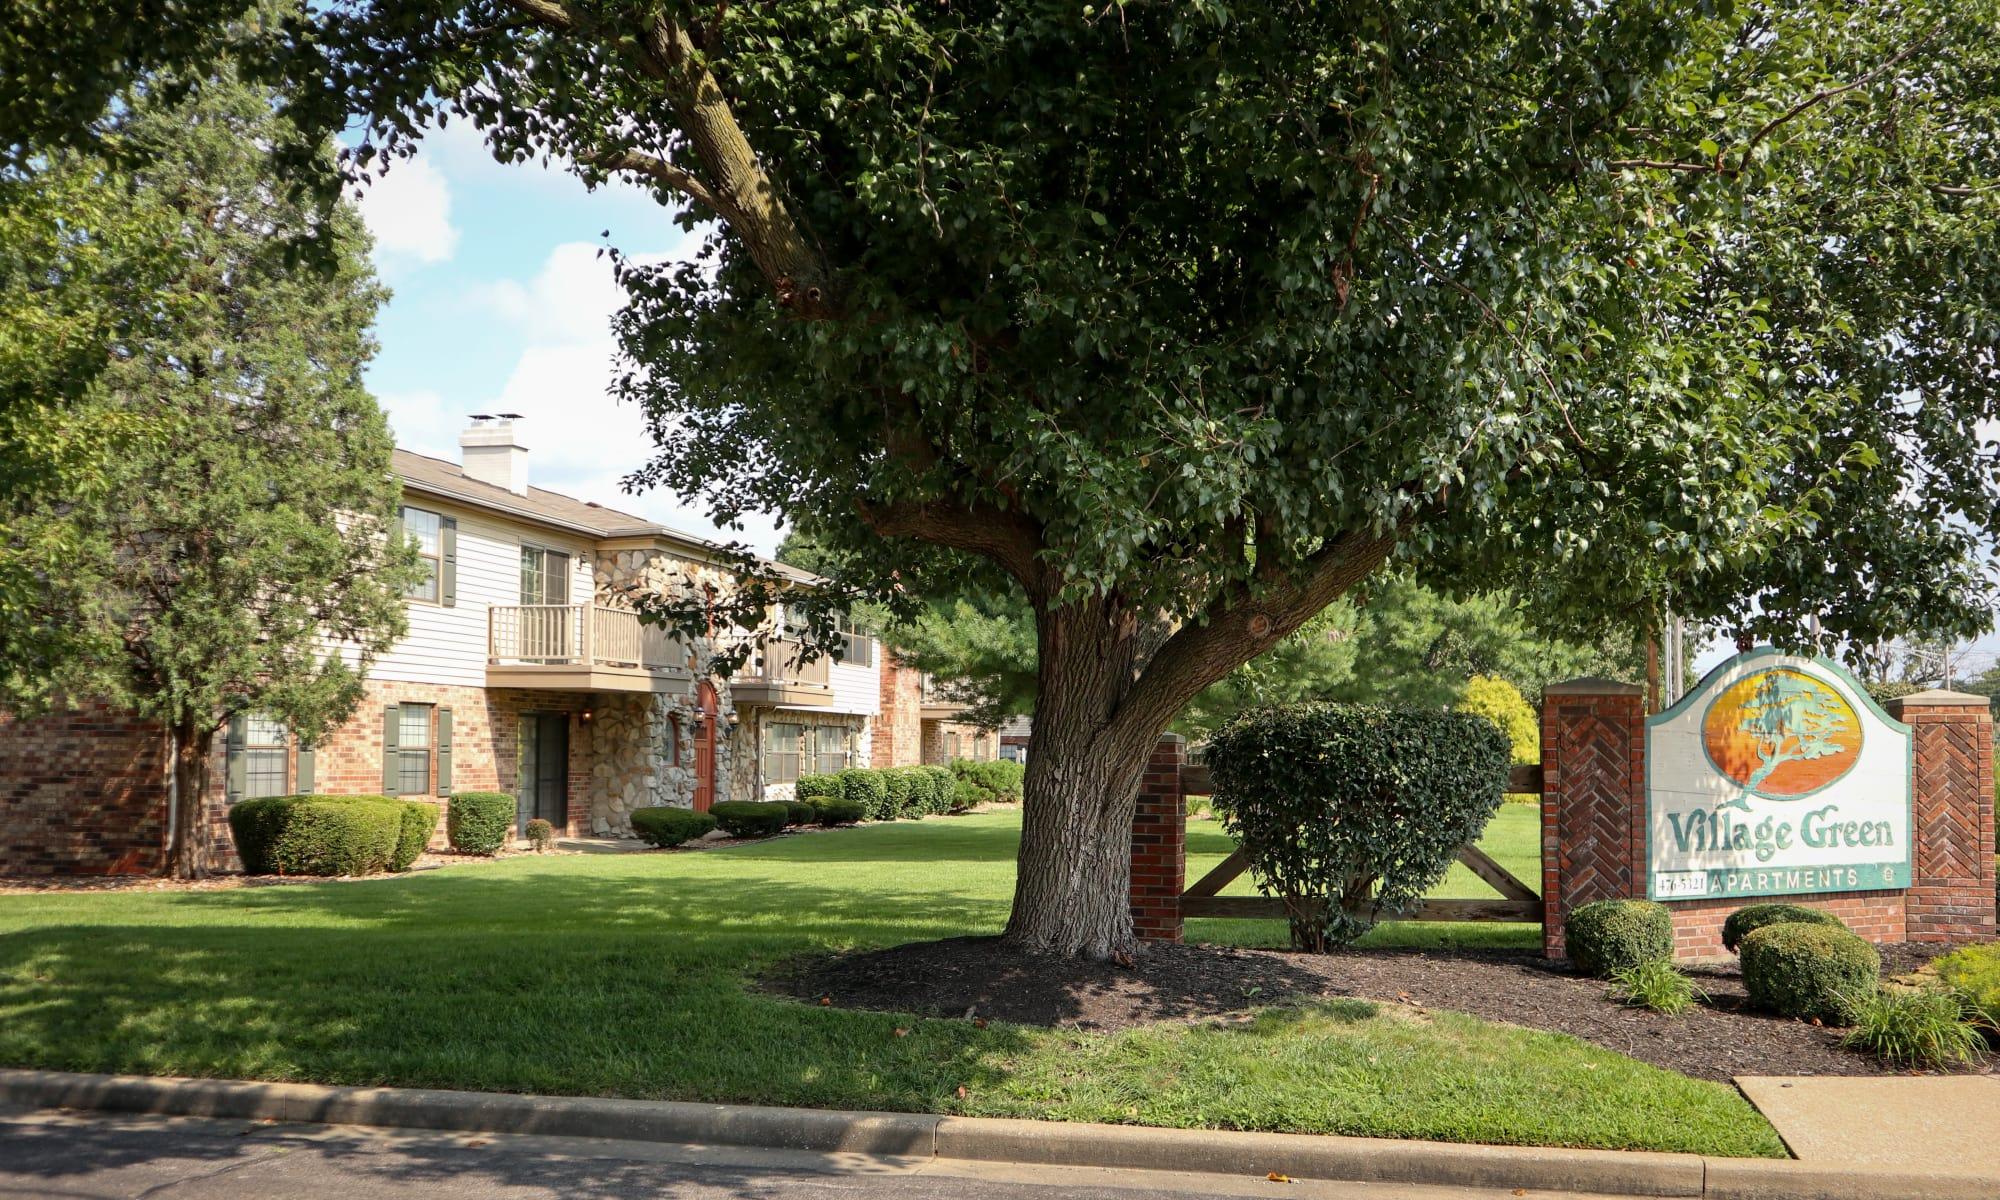 Apartments in Evansville, IN